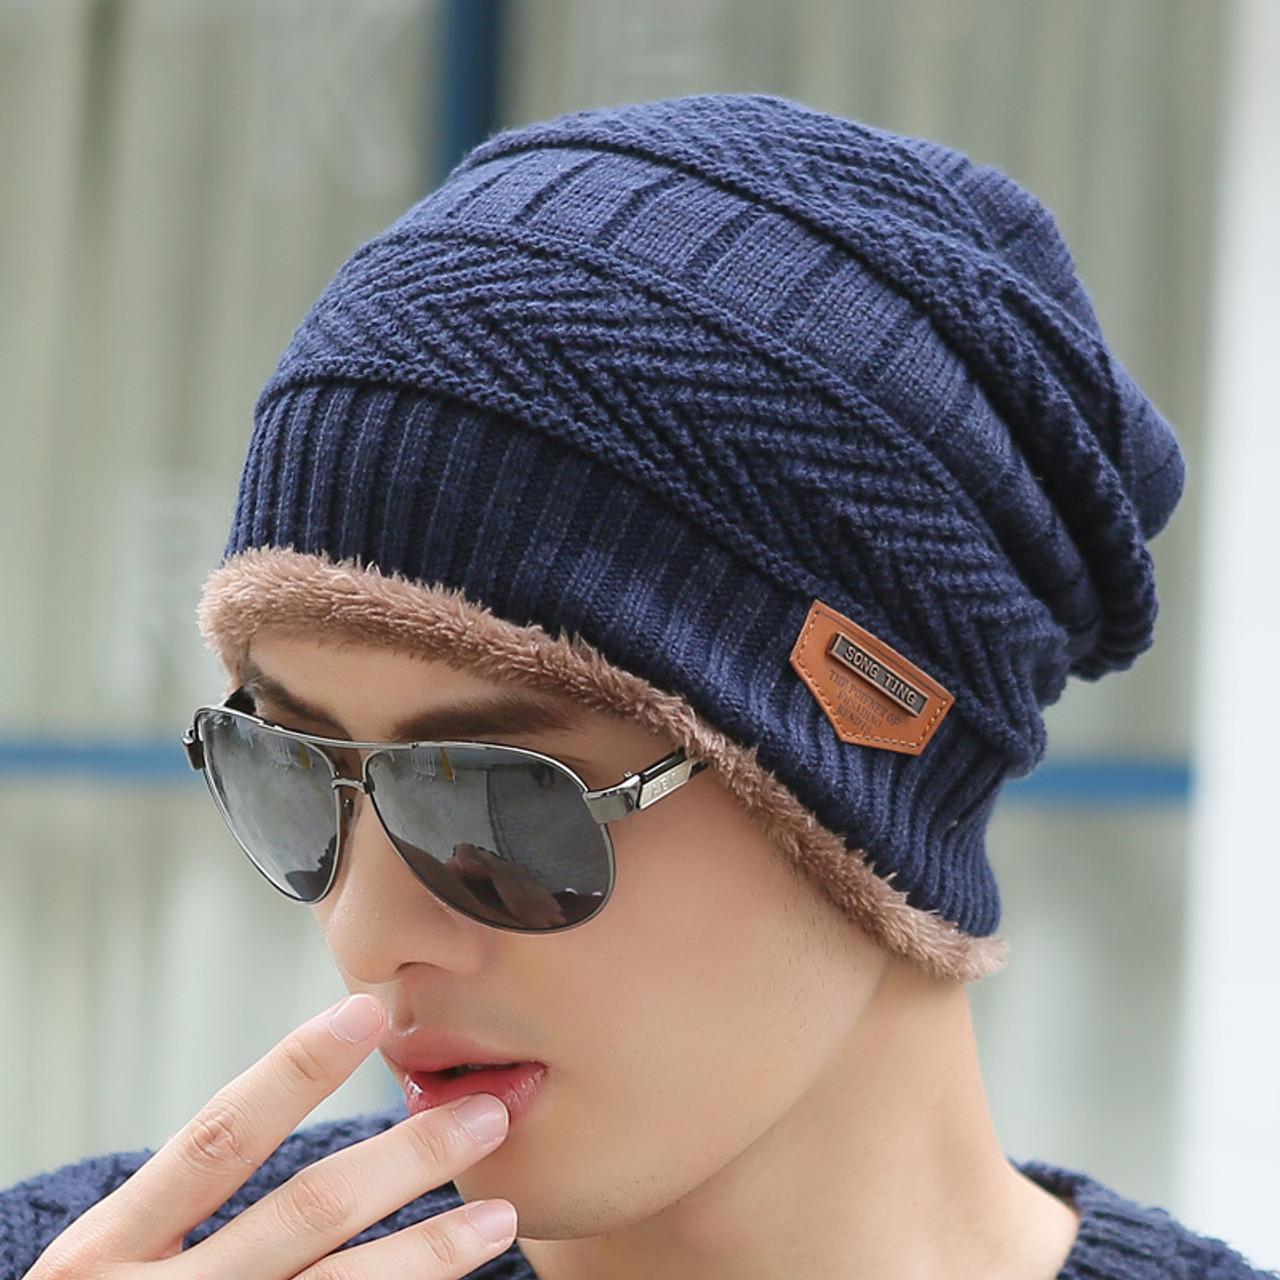 043967bcd2b ... Boys Men Winter Hat Knit Scarf Cap Winter Hats for Men Caps Warm Fur  Skullies Beanie ...